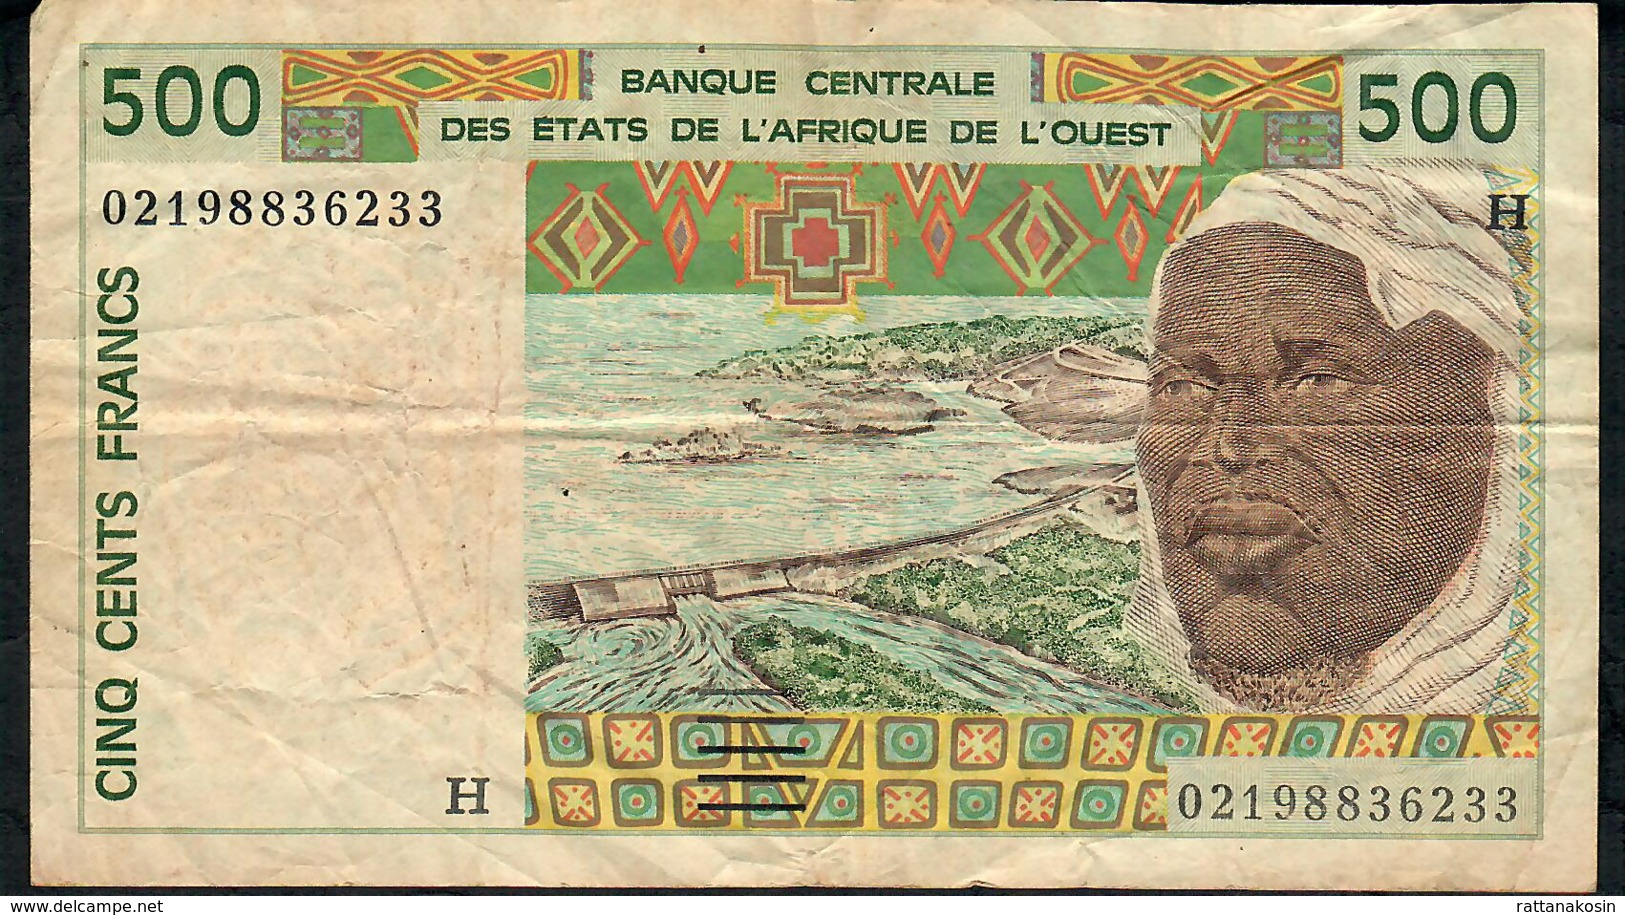 W.A.S. NIGER  P610Hl  500 FRANCS (20)02 FINE NO P.h. - Niger